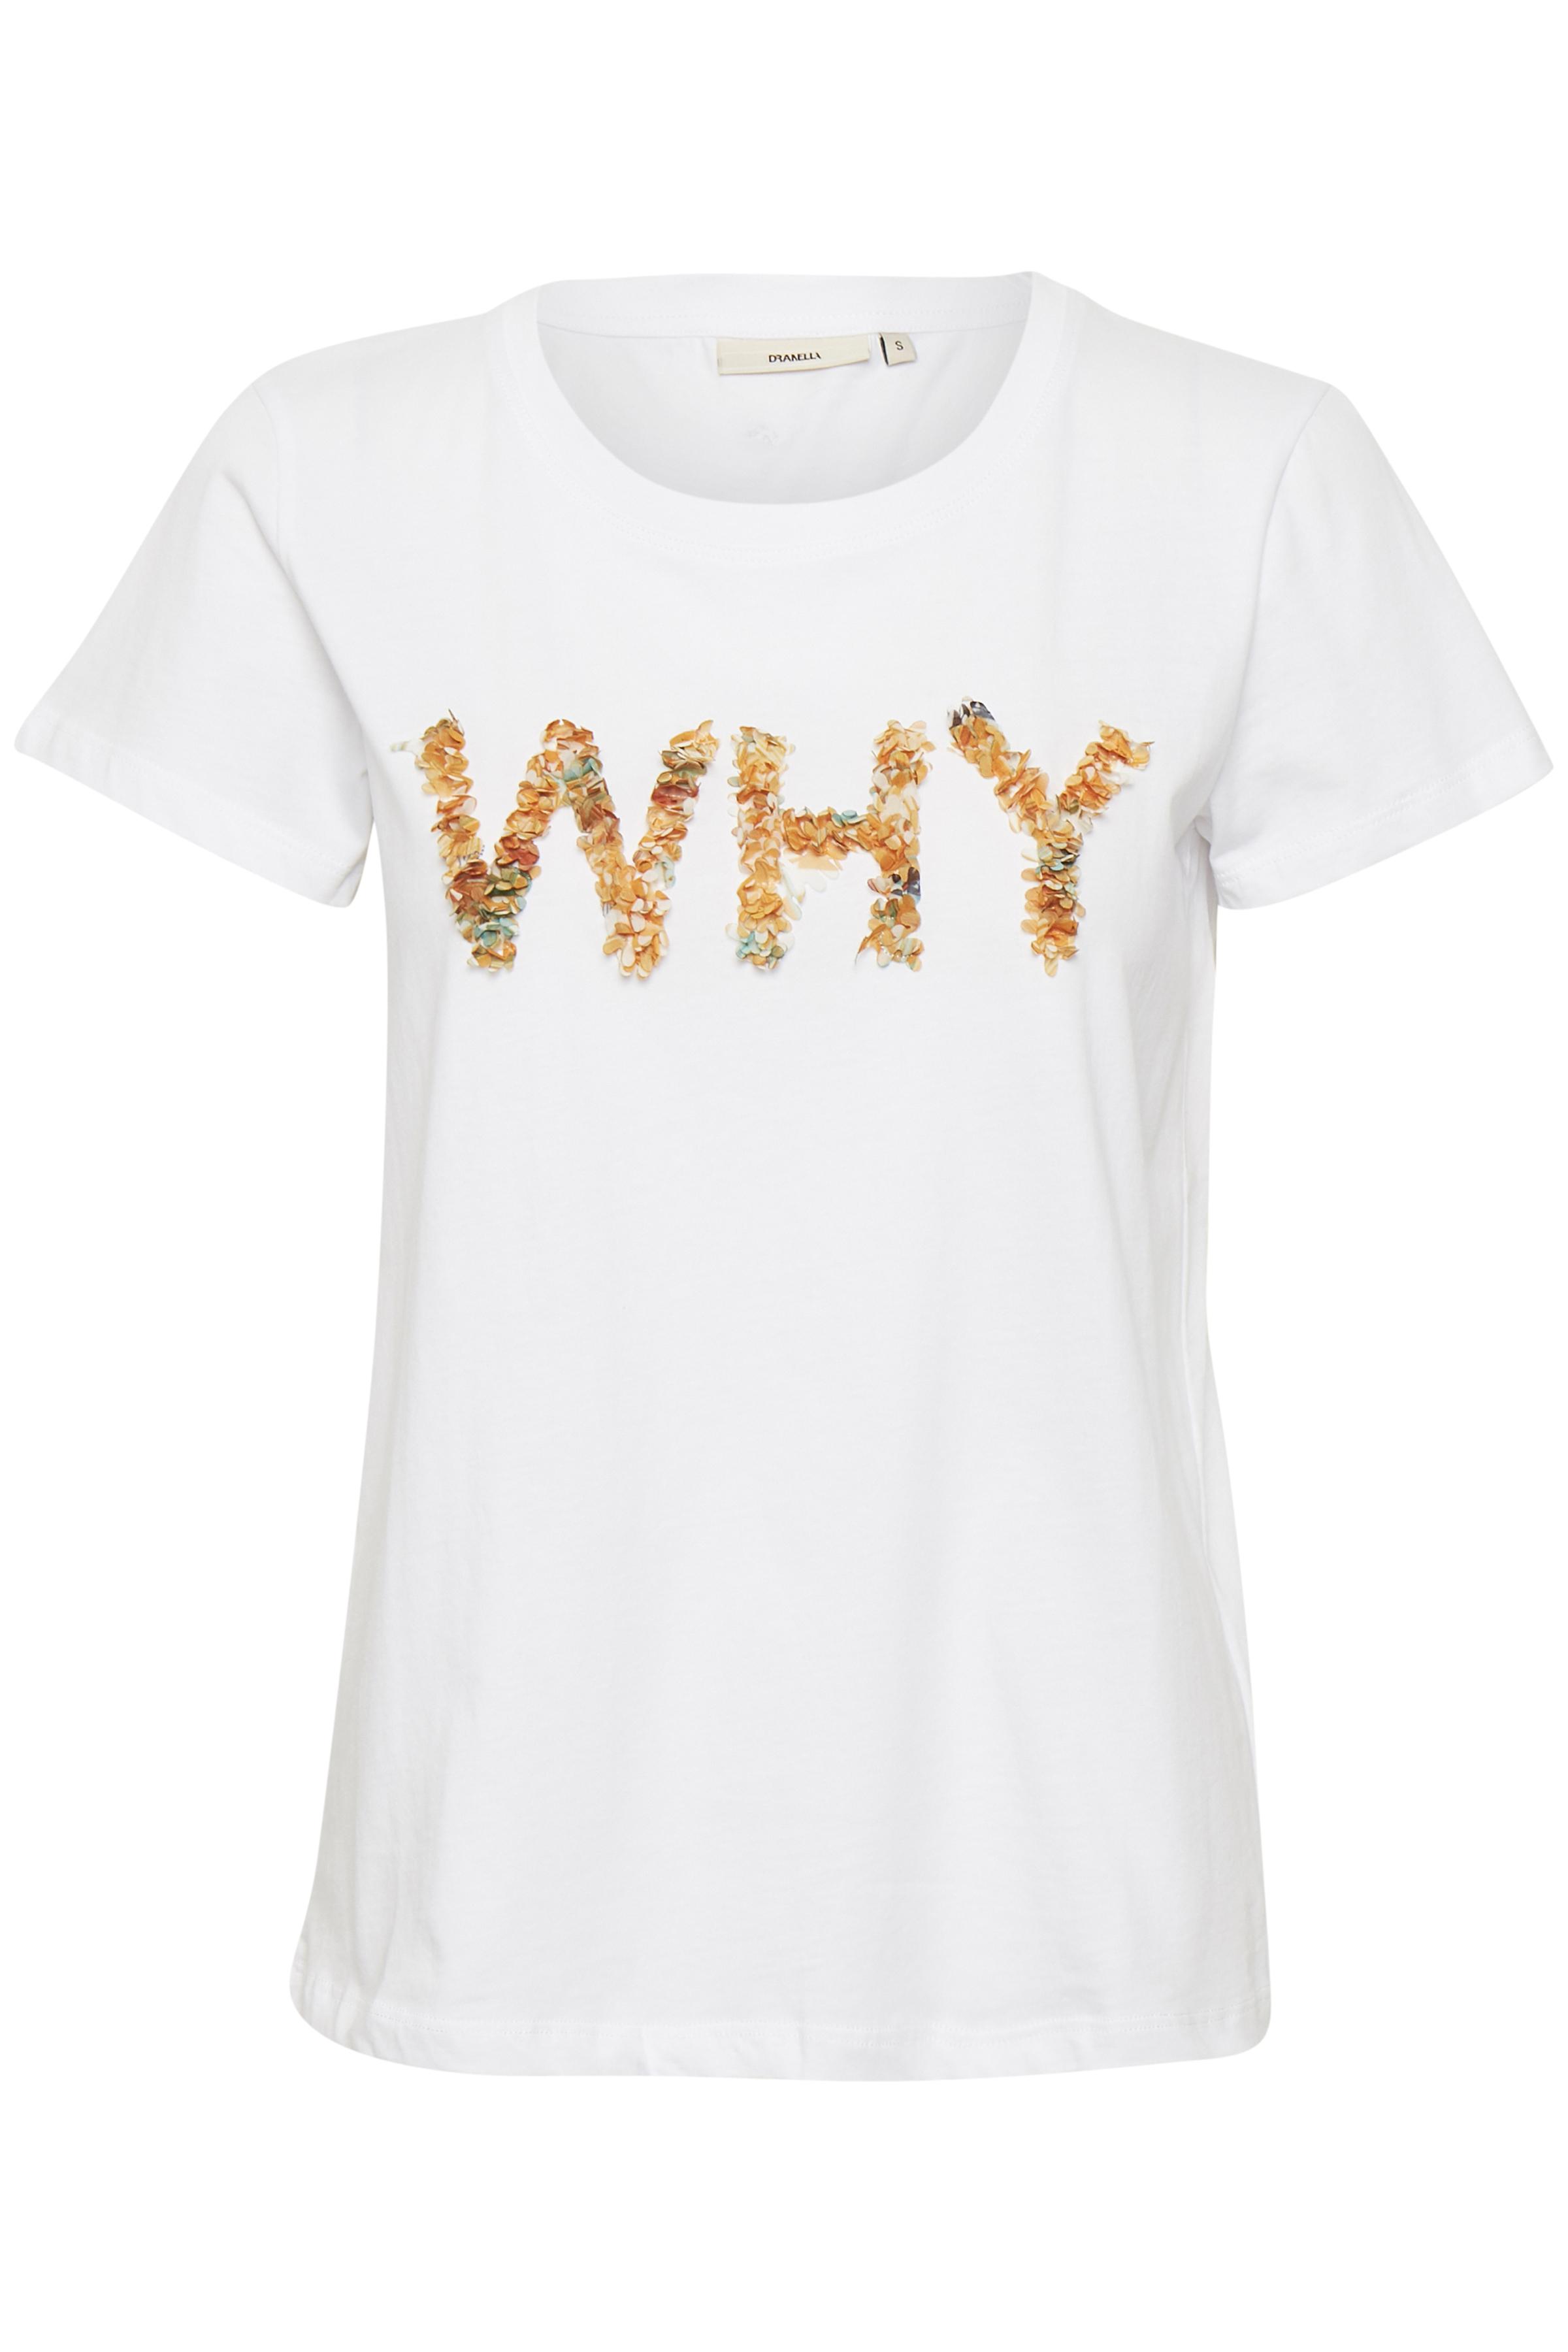 Image of Dranella Dame T-shirt - Hvid/gul